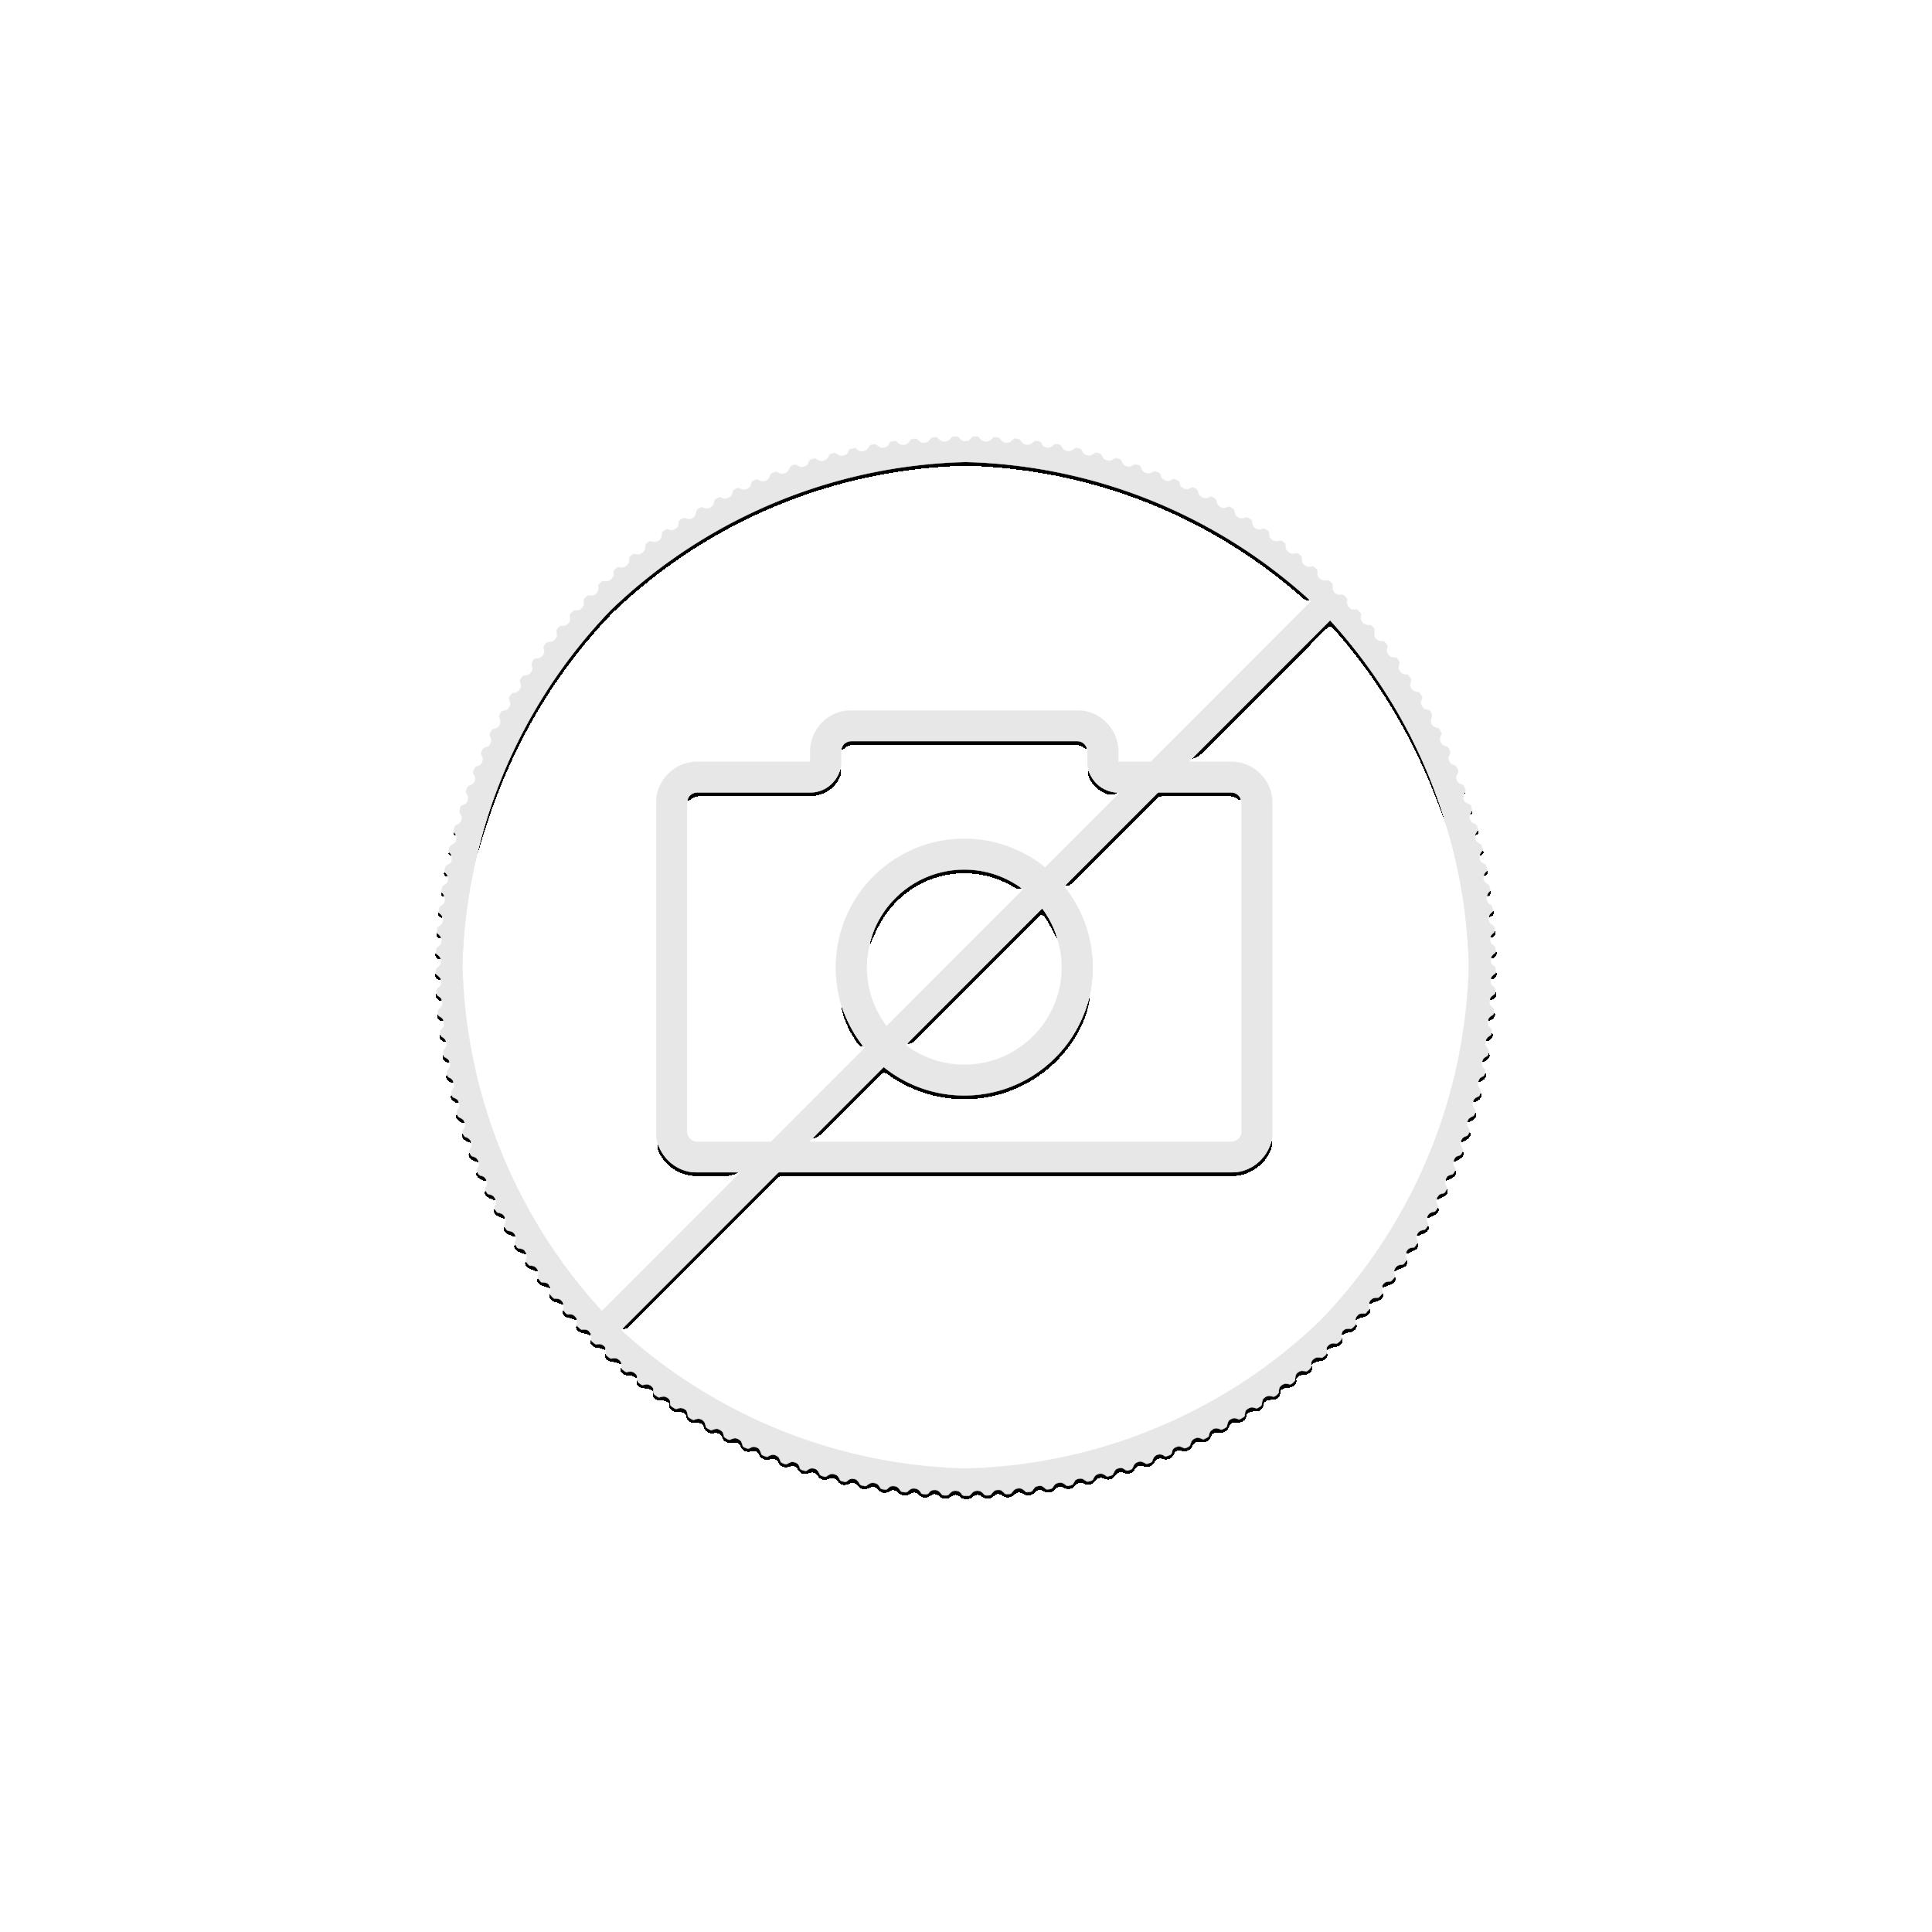 1 troy ounce zilveren munt Silver Eagle 2021 - type 2